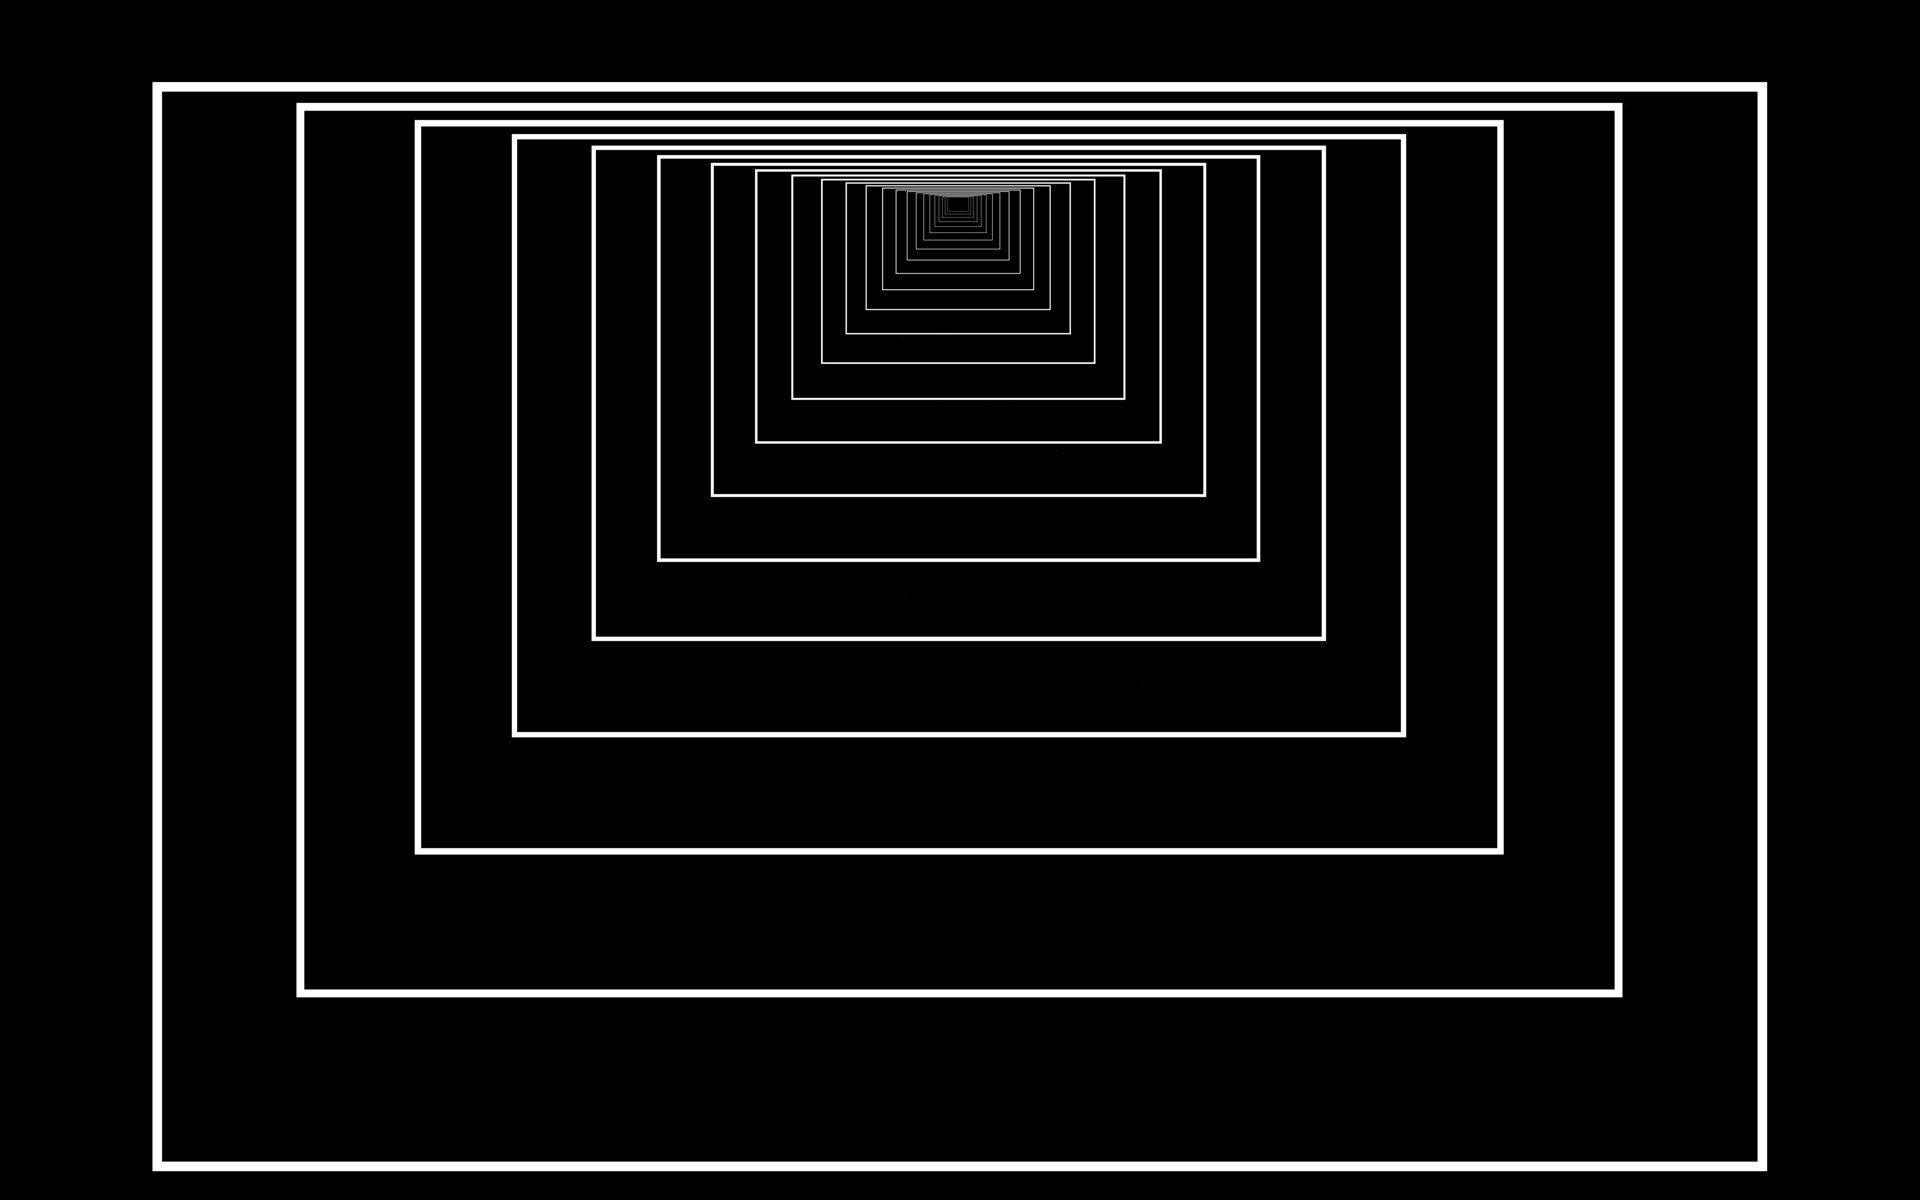 Most Inspiring Wallpaper High Resolution Mathematics - 7f7b1a0d9c16c486f416478d3ead3931  You Should Have_743579.jpg